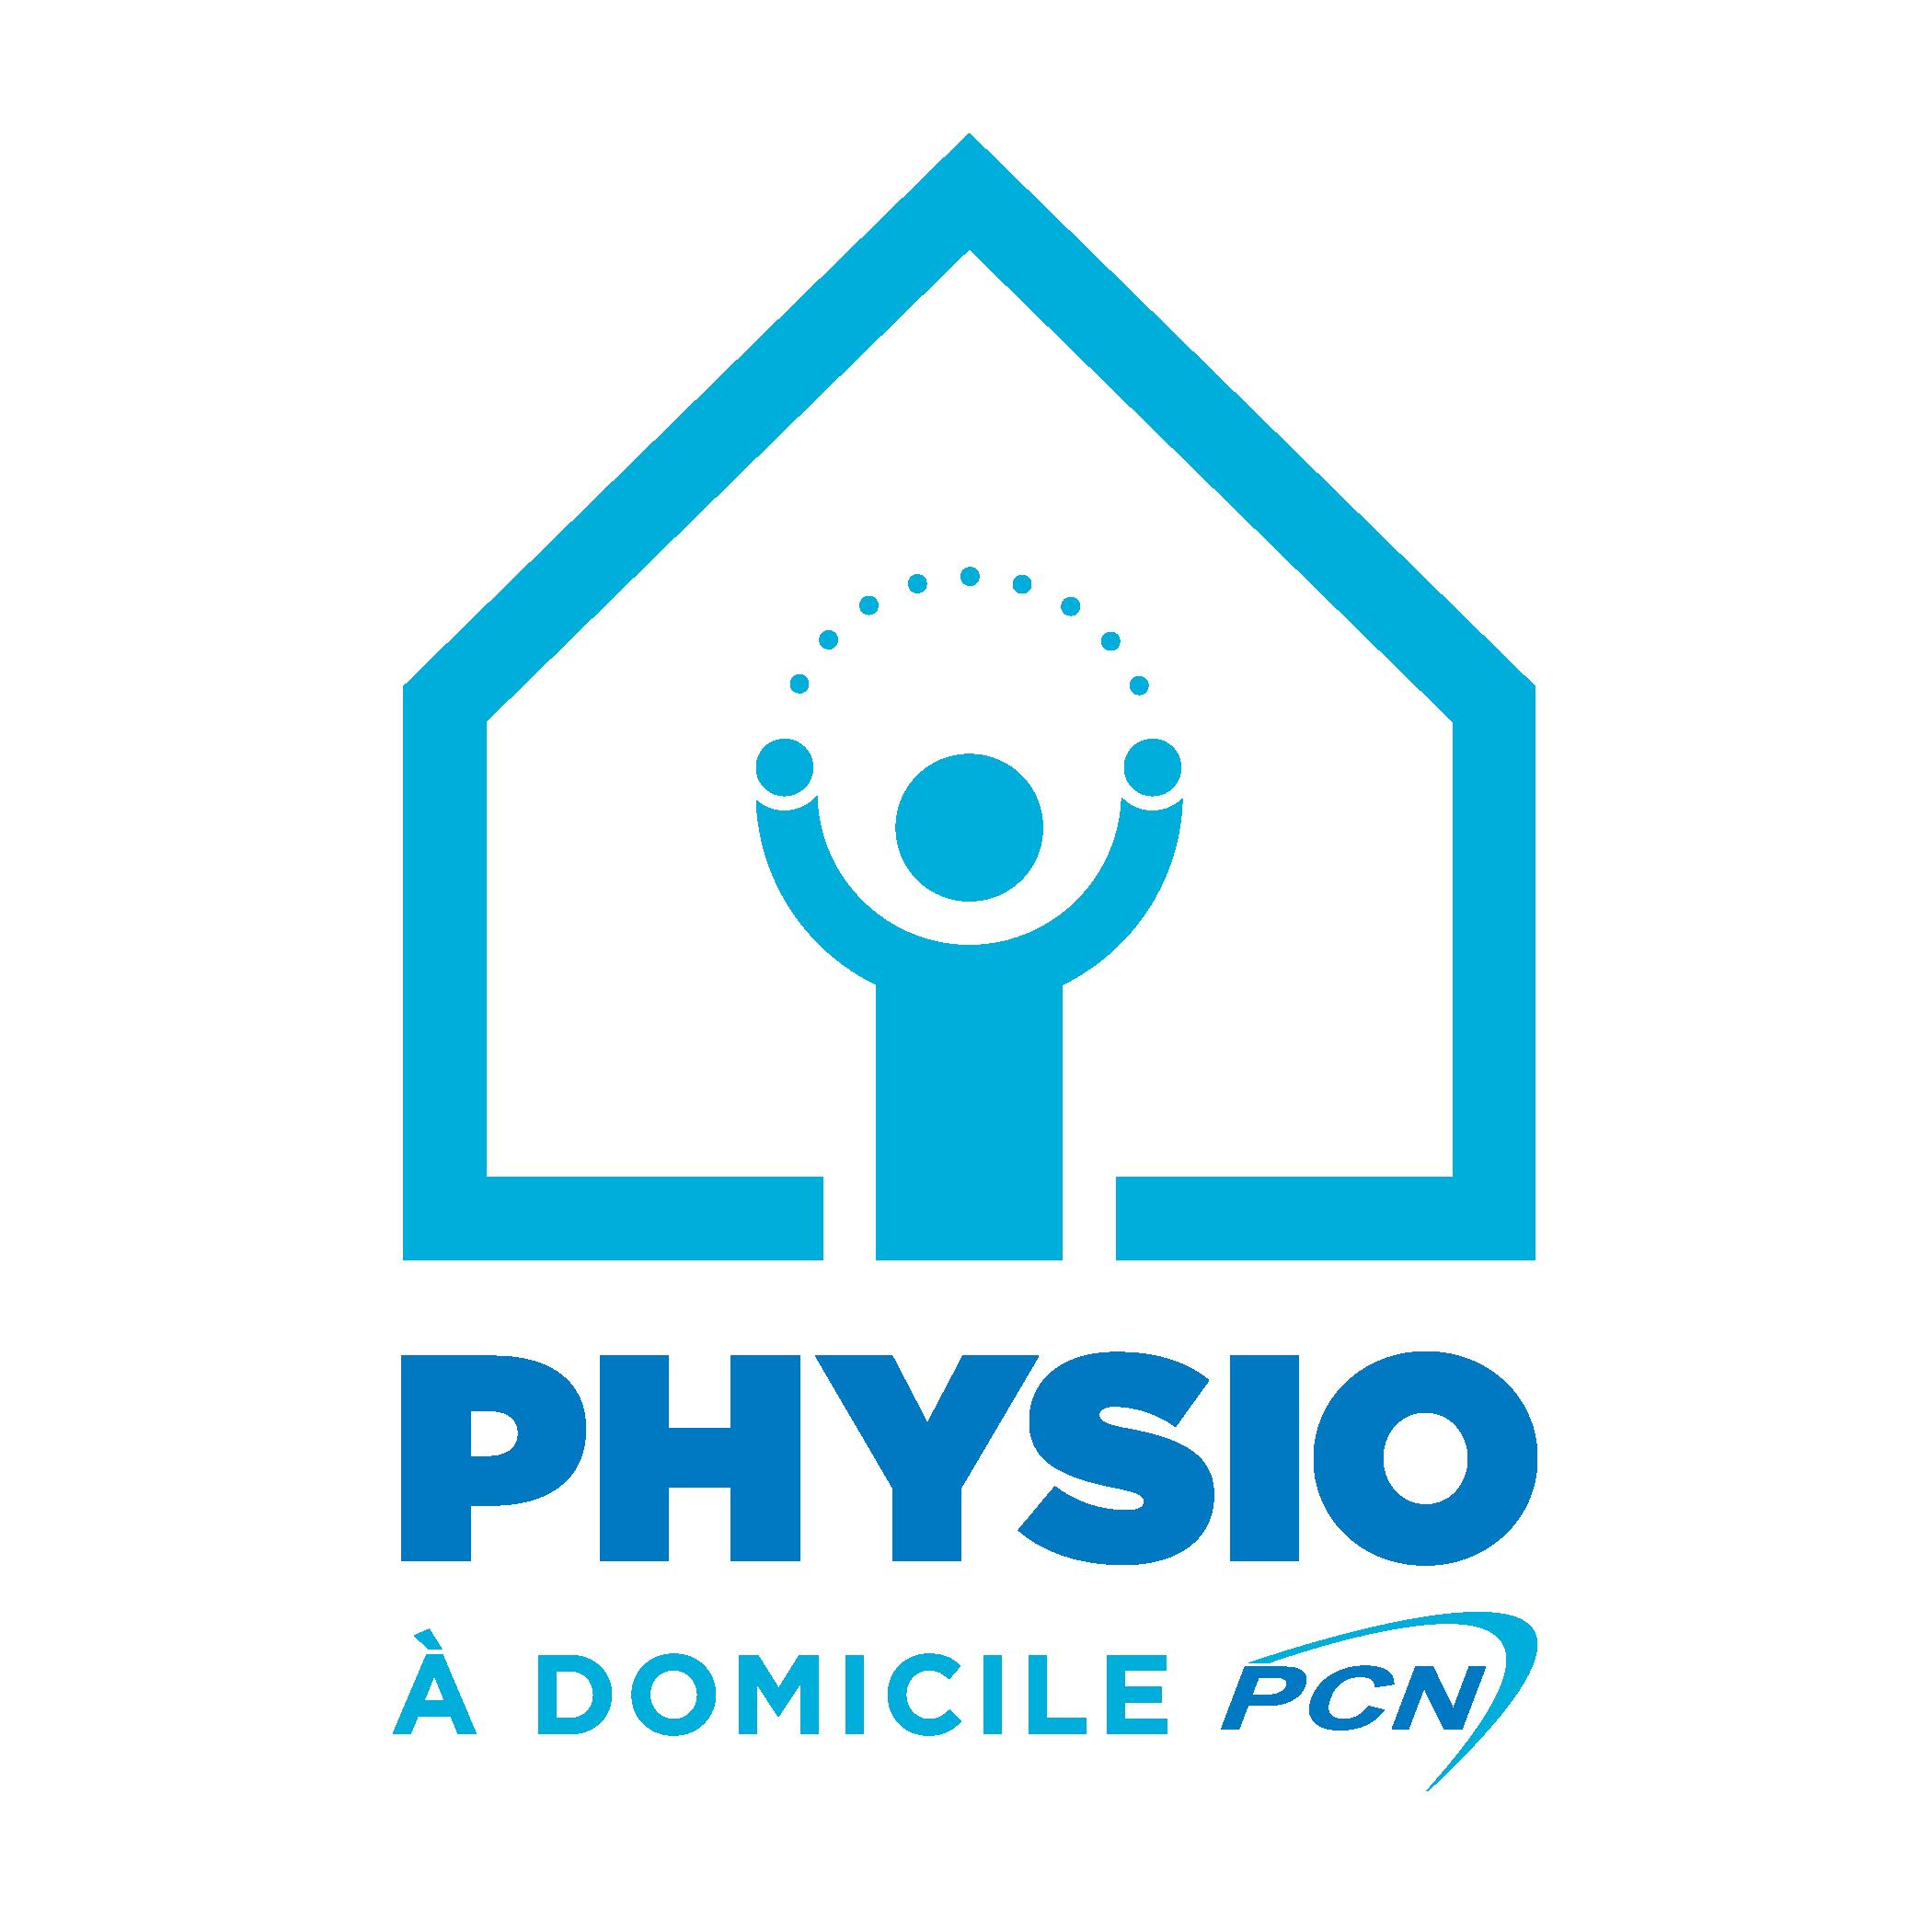 Physio à domicile